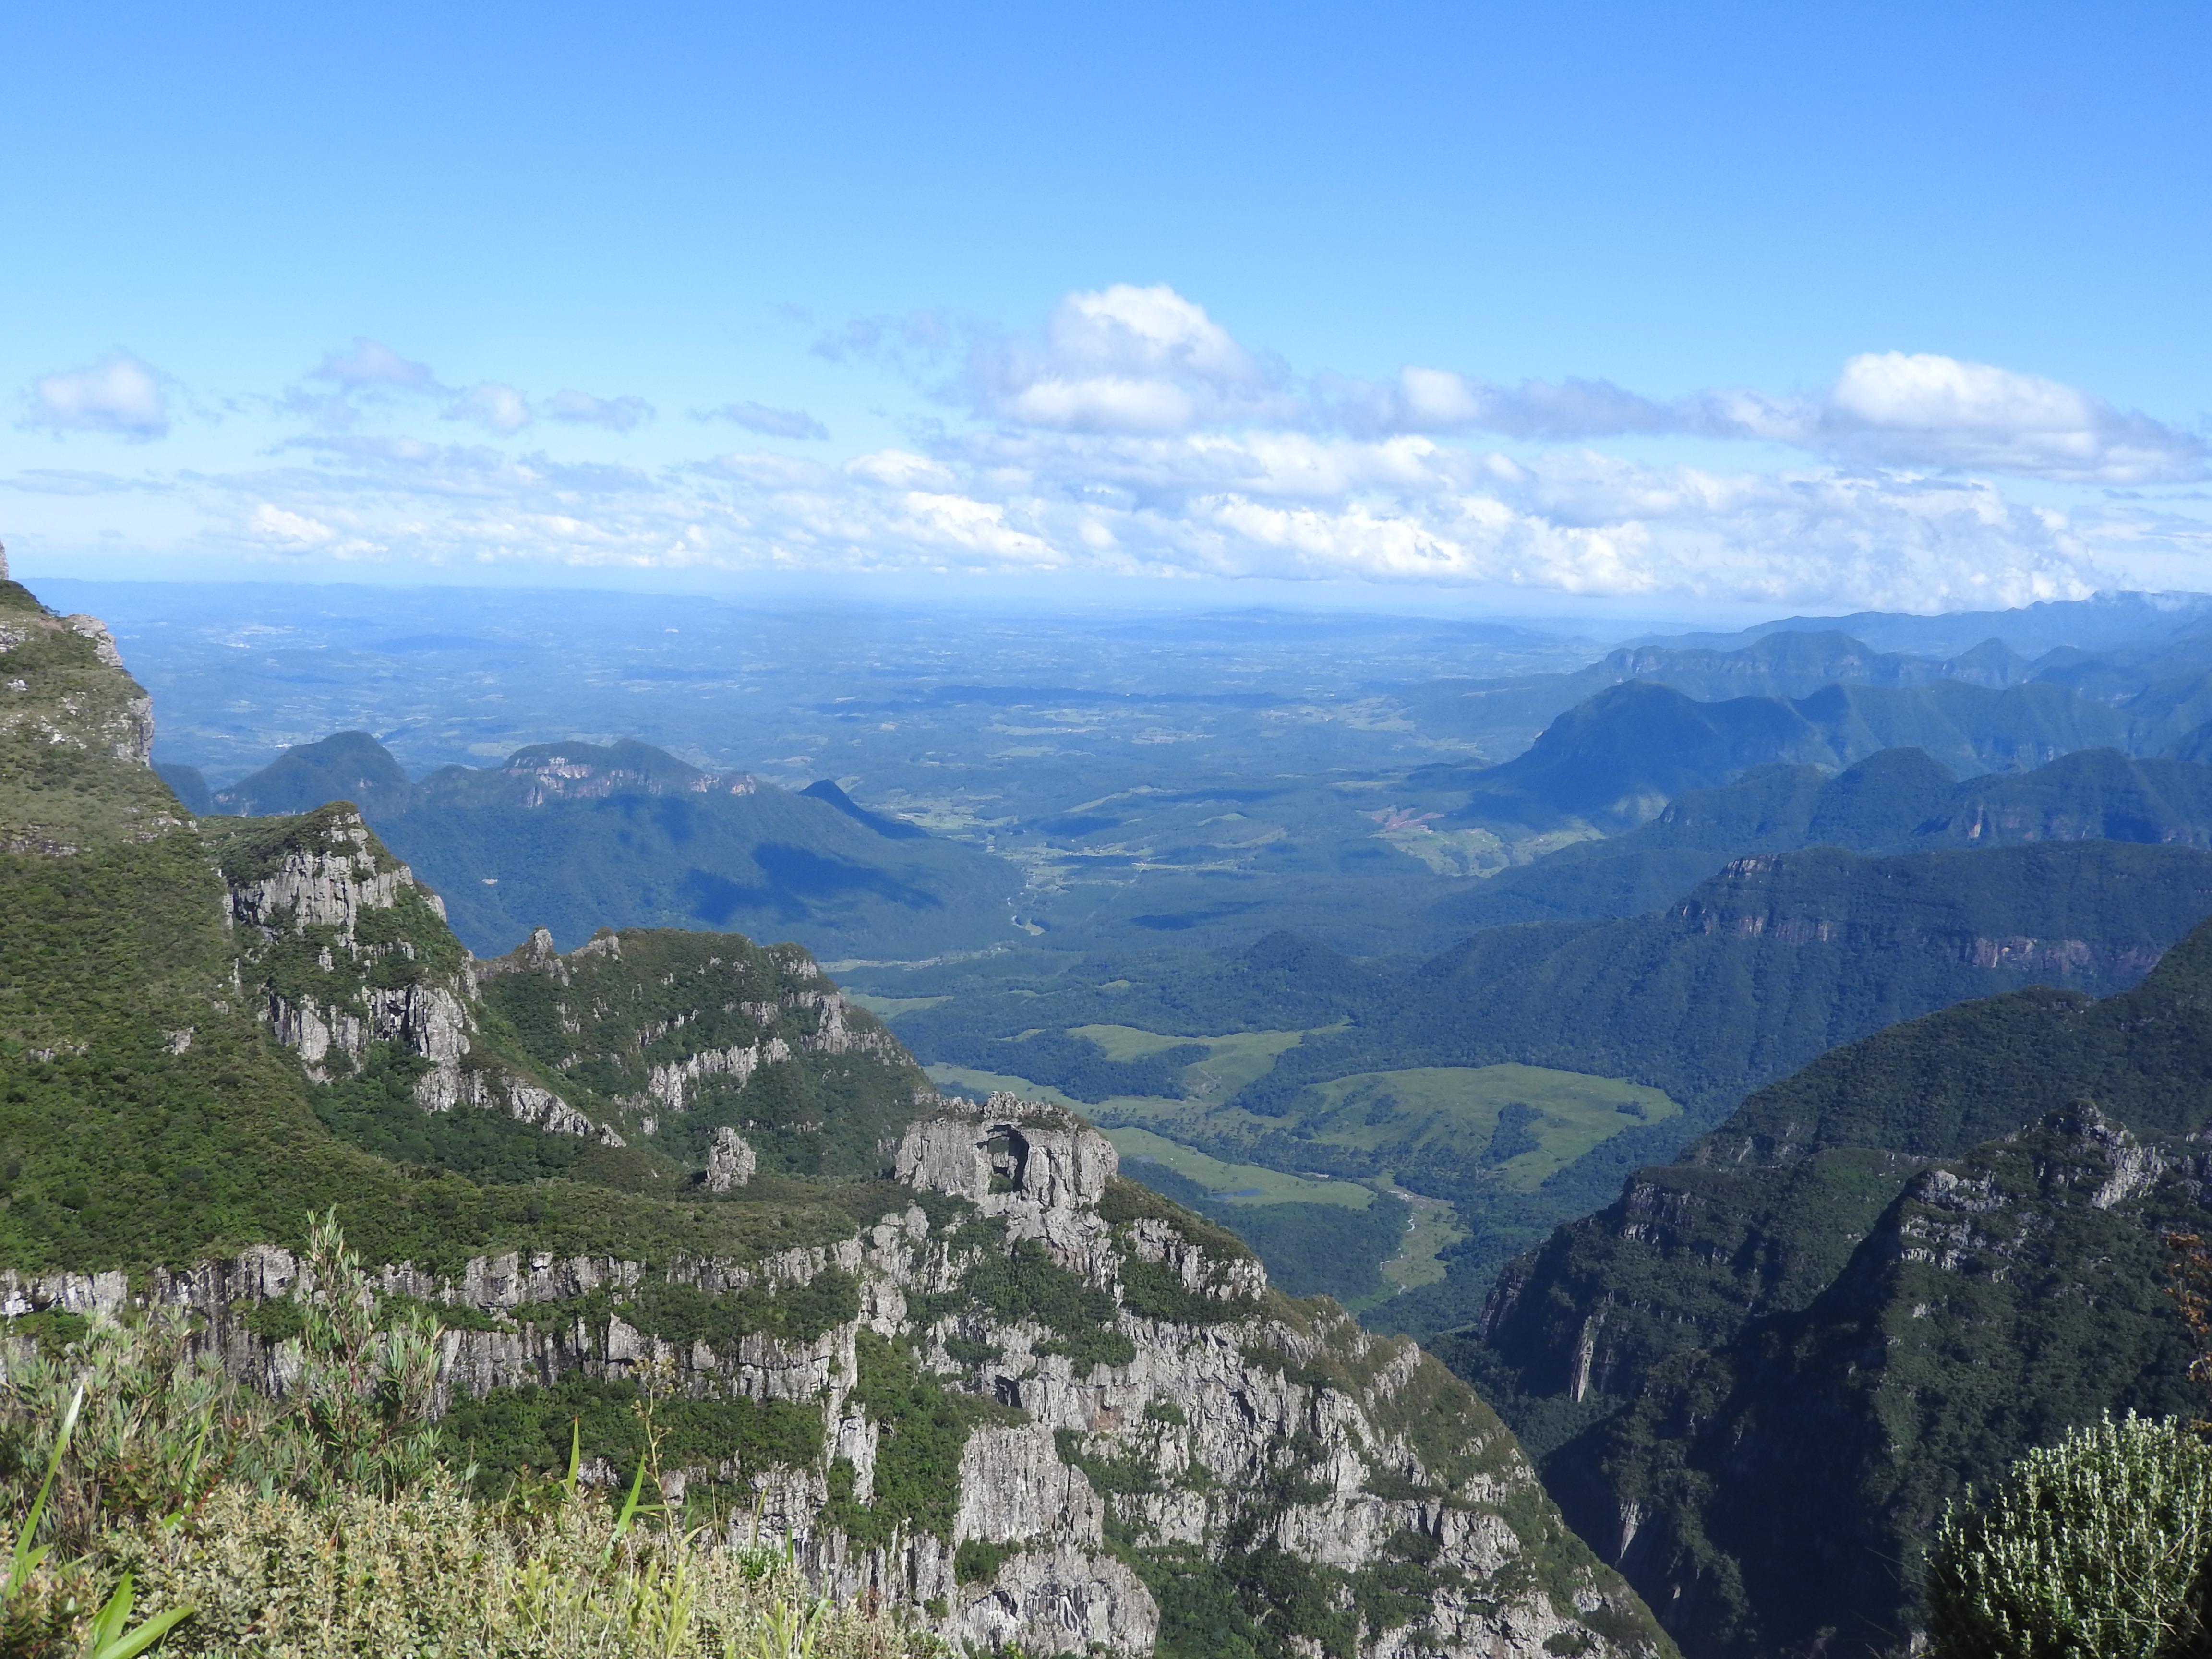 Urubici, a mais linda cidade da Serra Catarinense